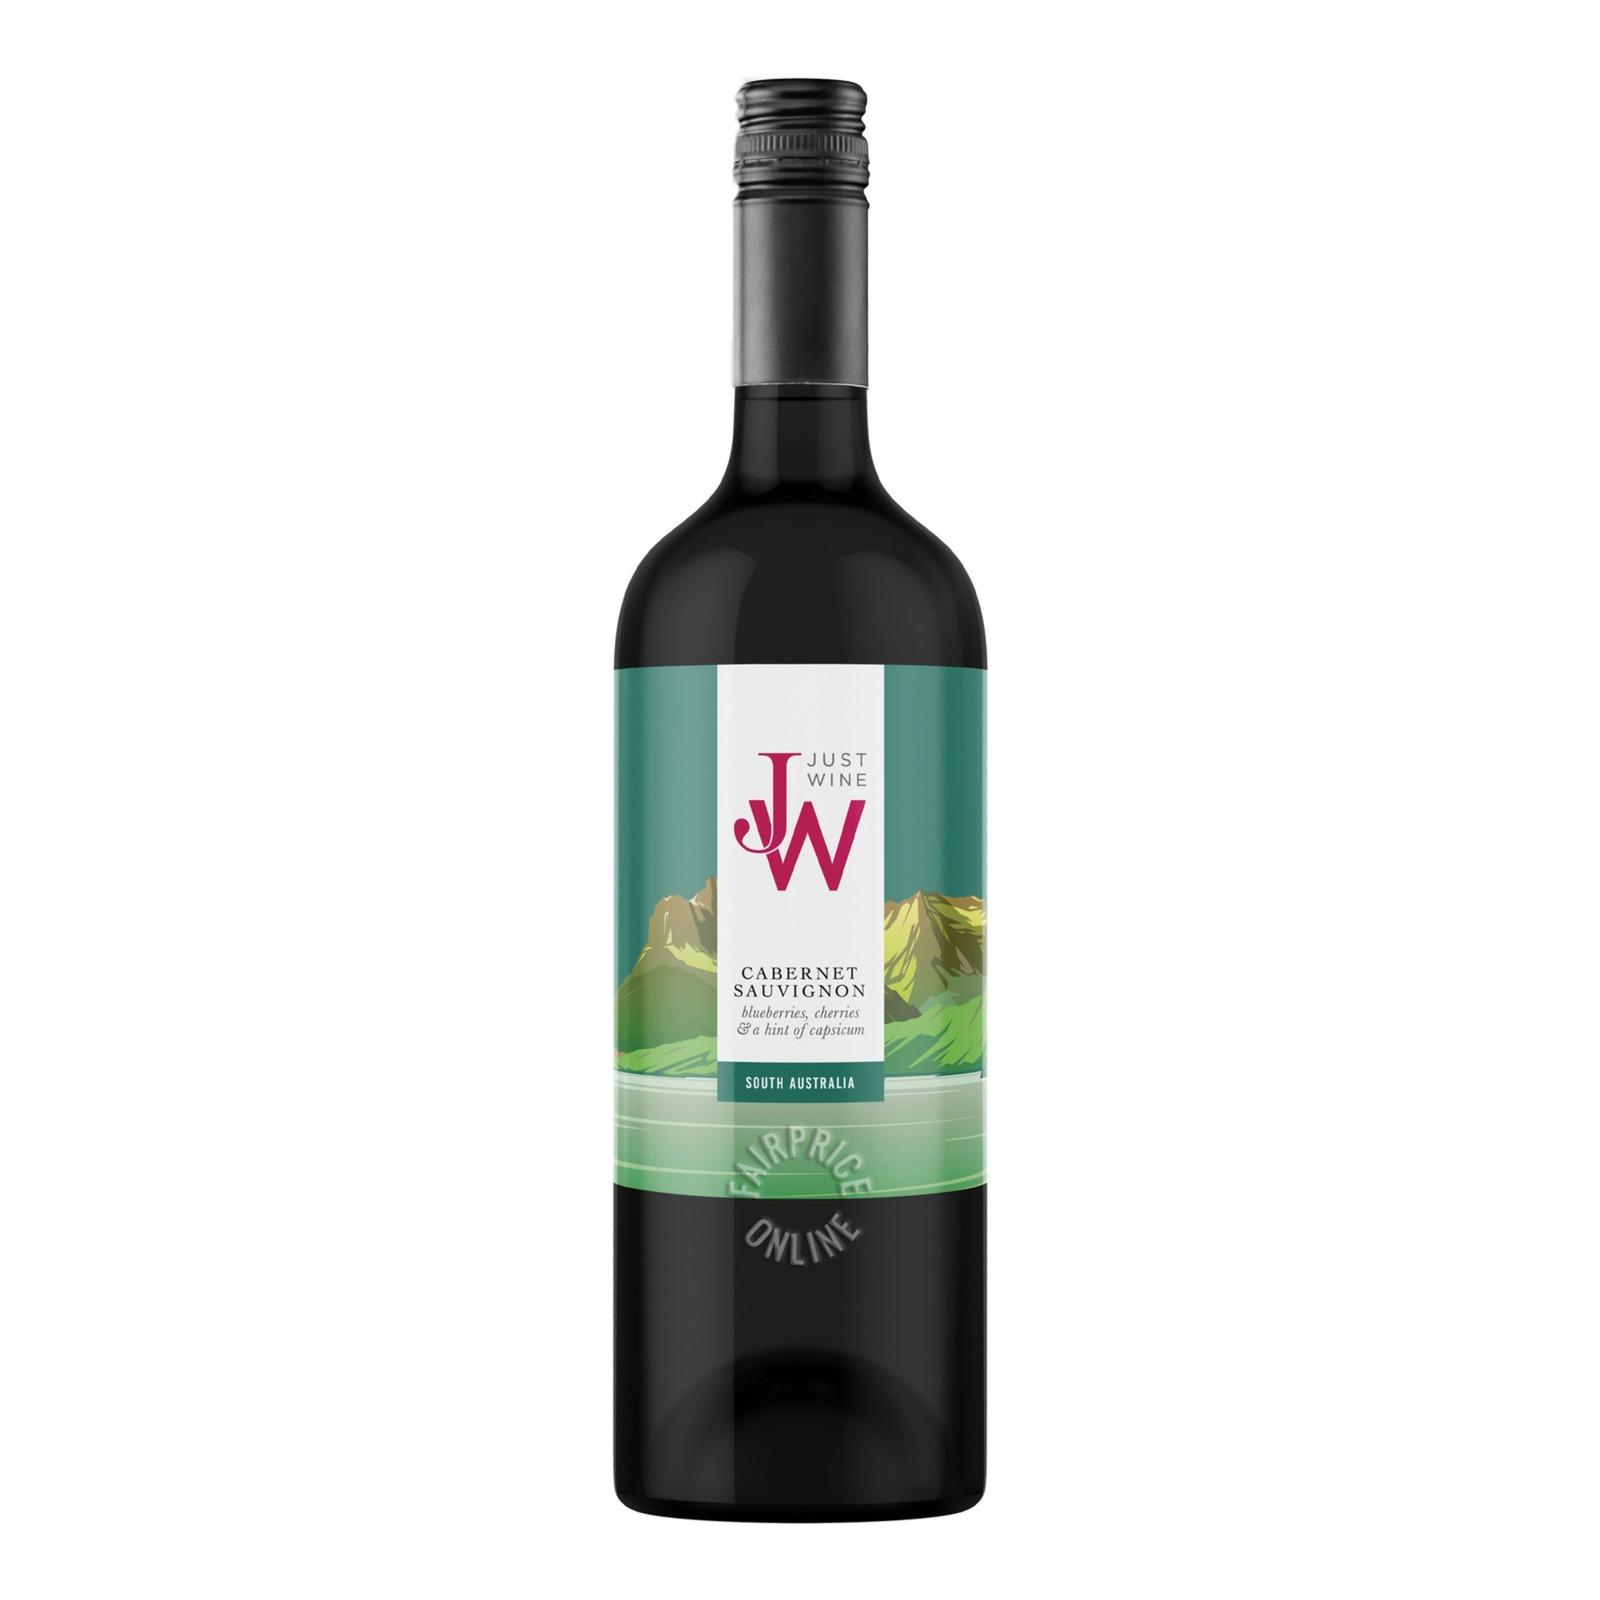 Just Wine Red Wine - Cabernet Sauvignon